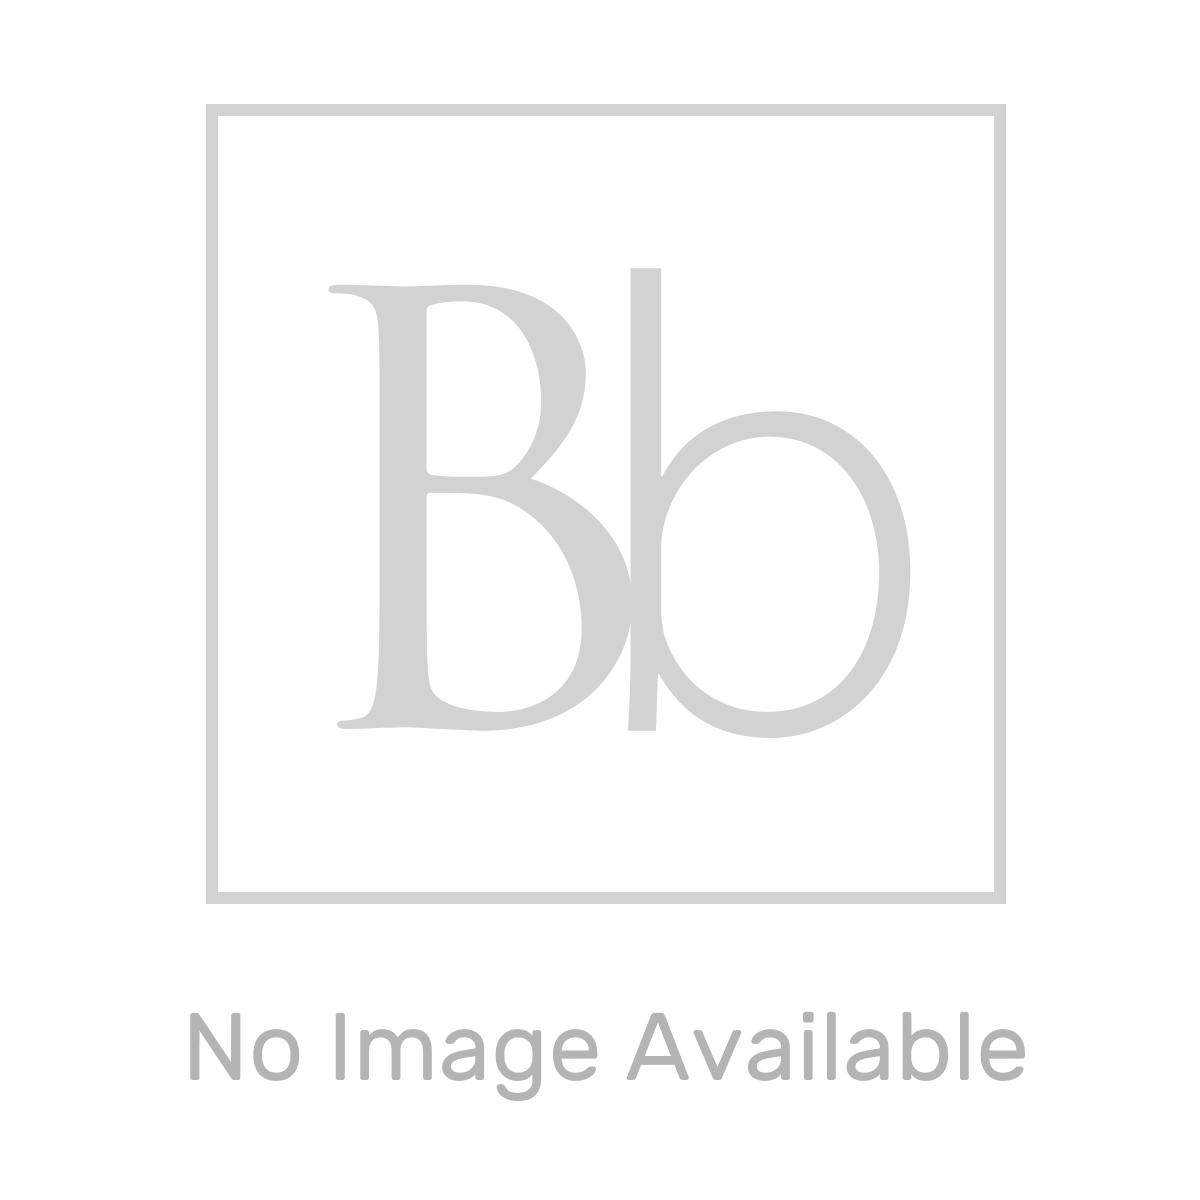 Frontline Reserva Luxury Single Ended Bath